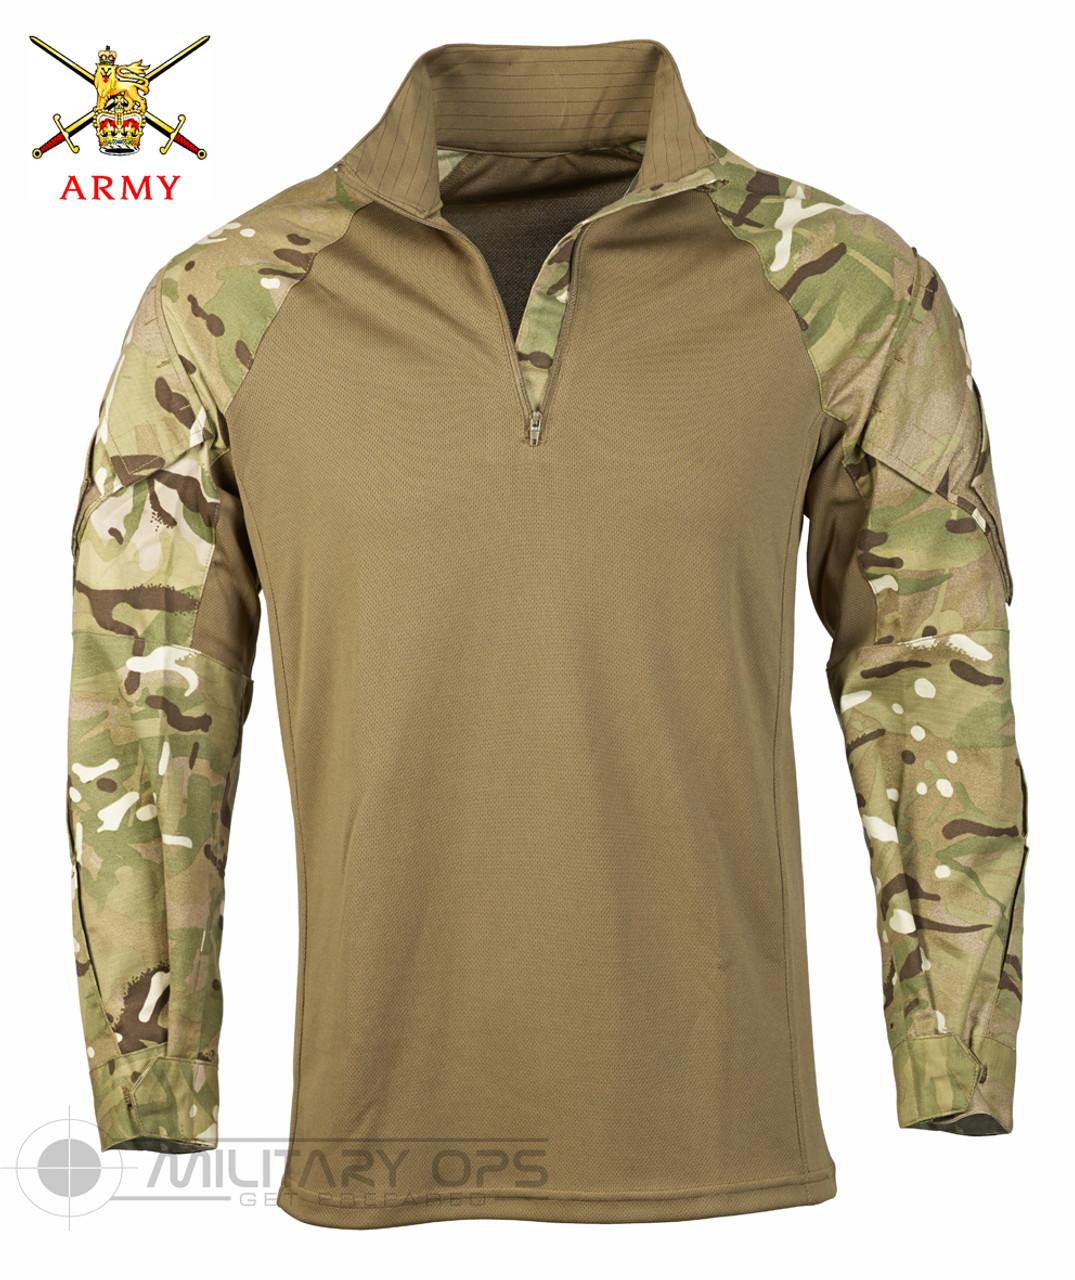 f29e3a47 British Army Issue Ubac Shirt MTP ( NEW) - MilitaryOps Ltd